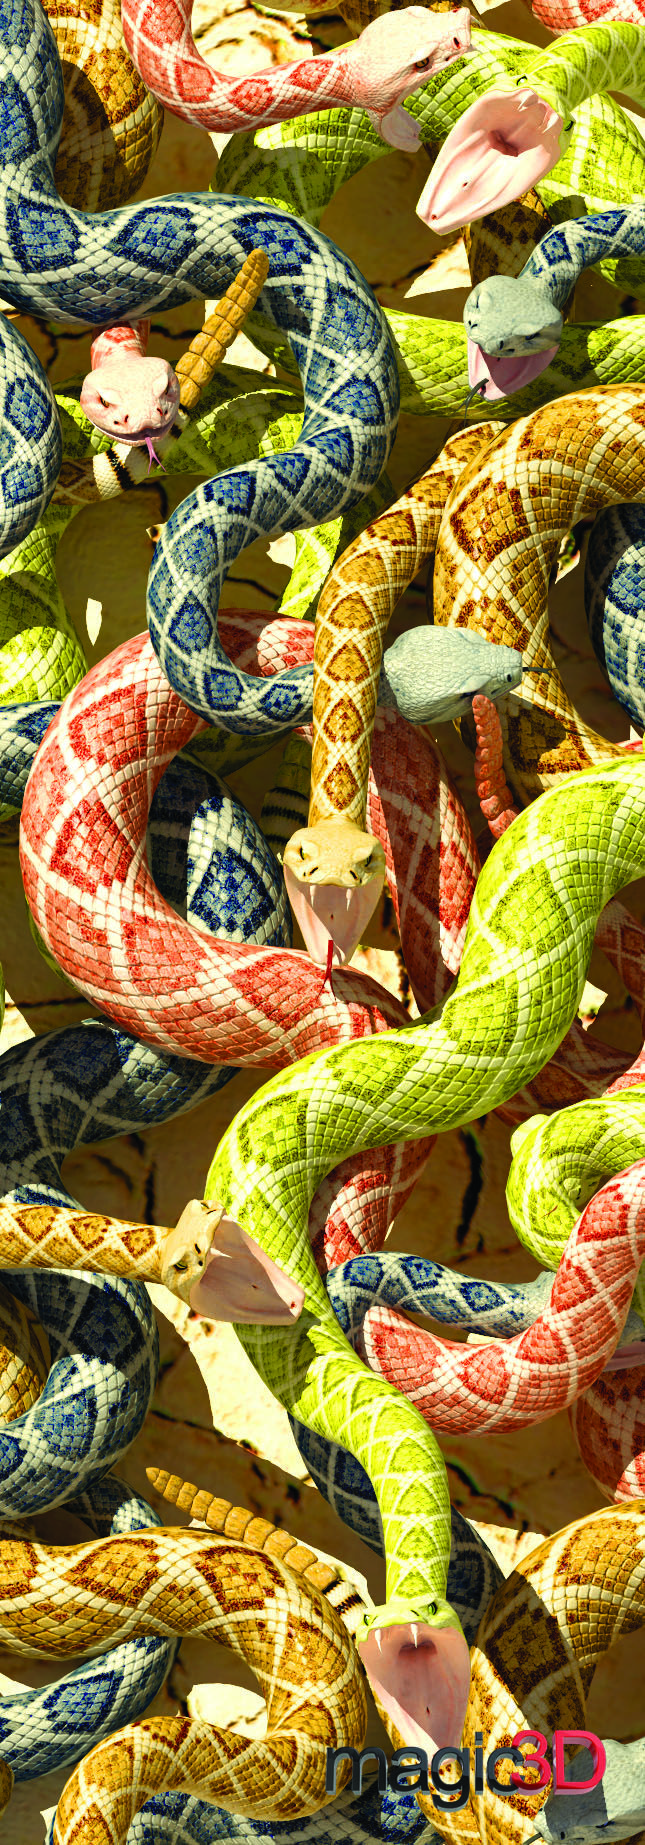 "Magic 3D Snakes - Bookmark/6"" Ruler #020"